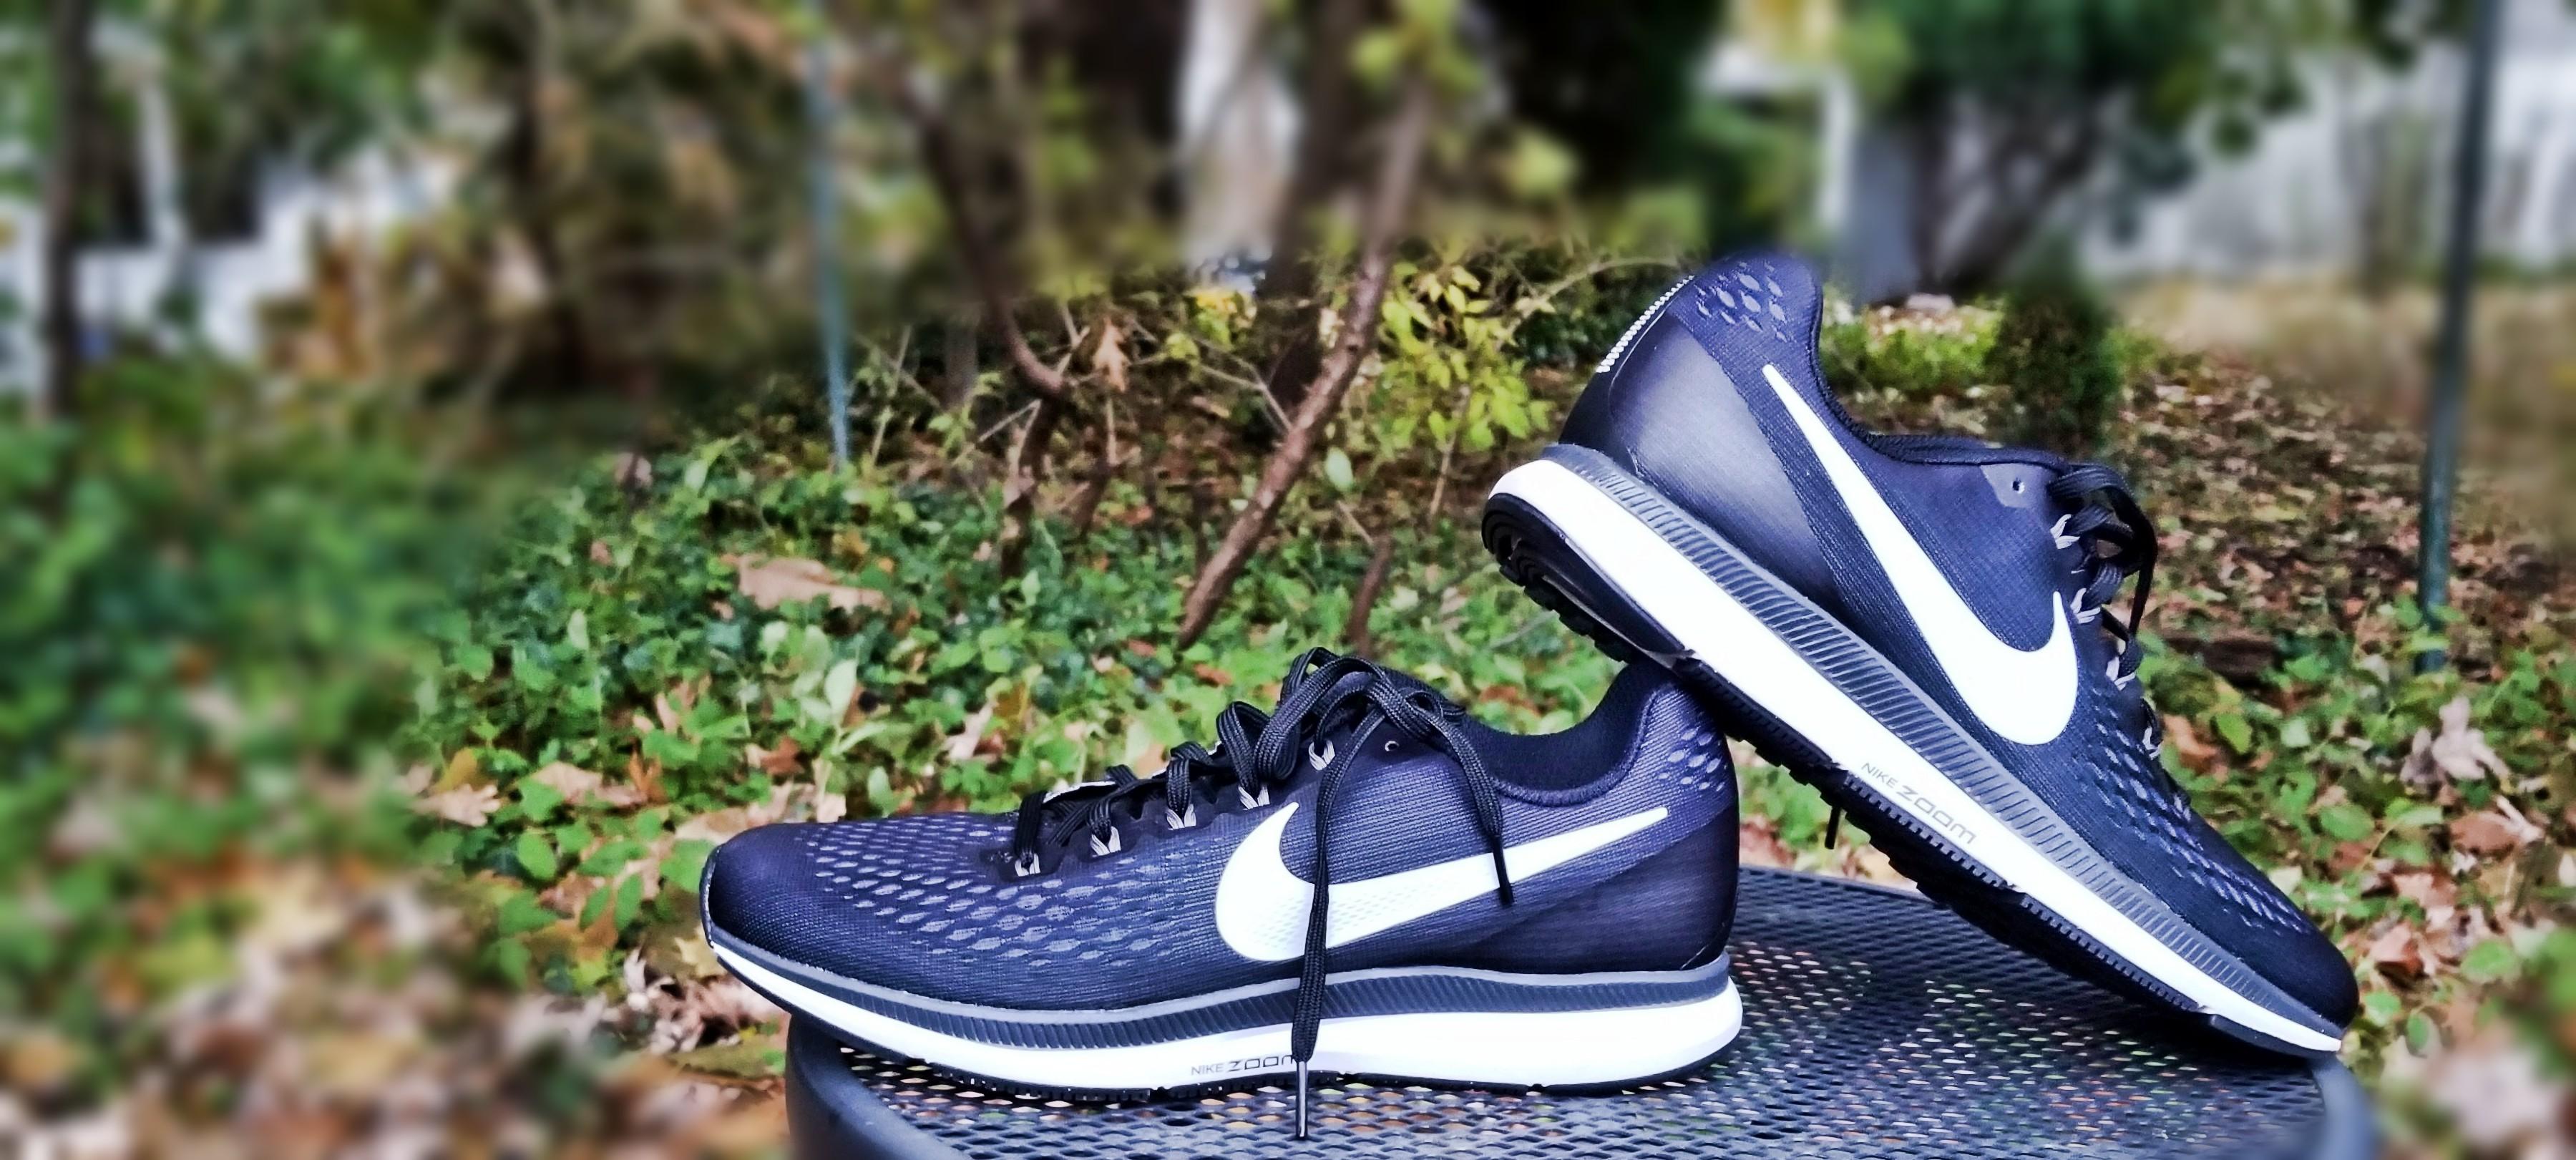 finest selection ce2ba 8a51e Comfort  The Nike Air Zoom Pegasus 34′s ...